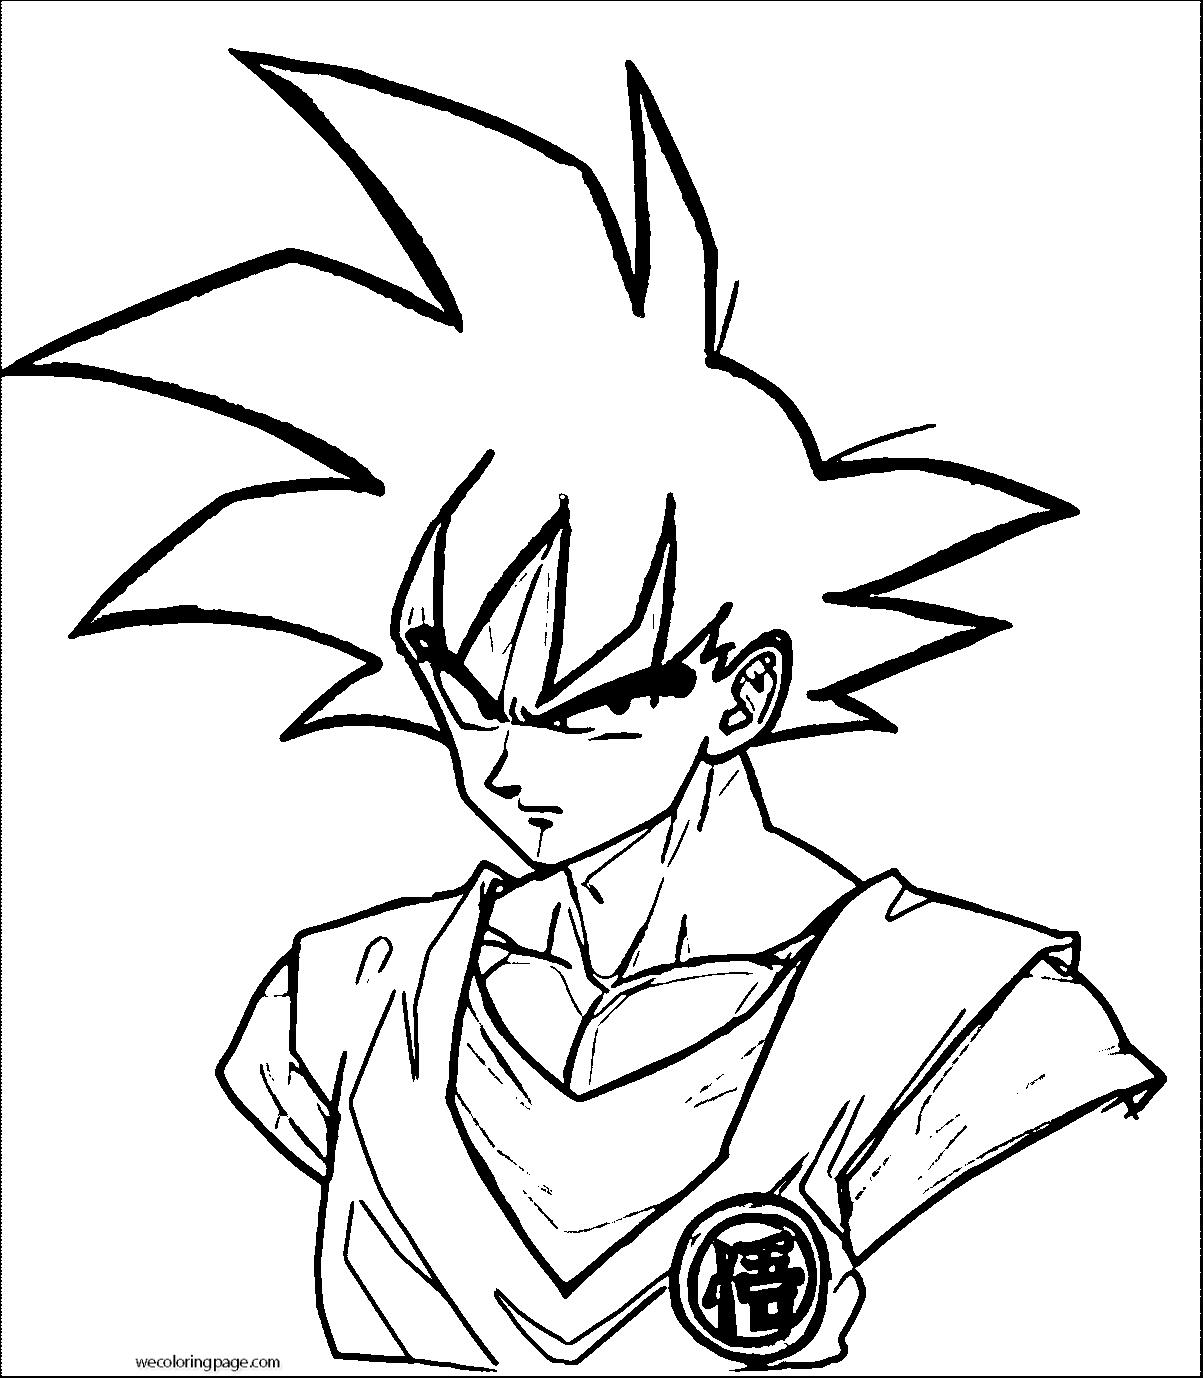 Goku We Coloring Page 018